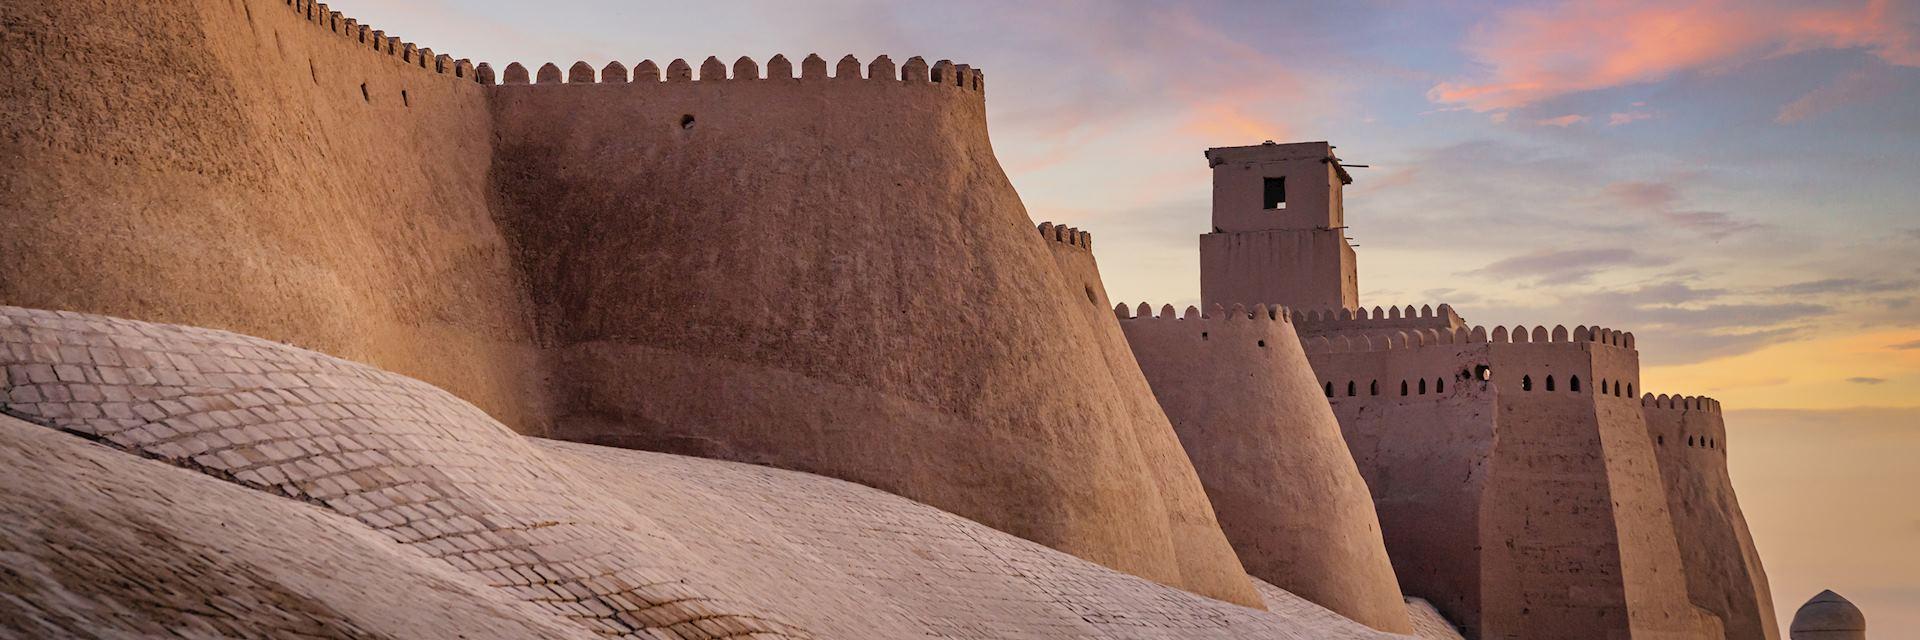 Ancient city walls, Khiva